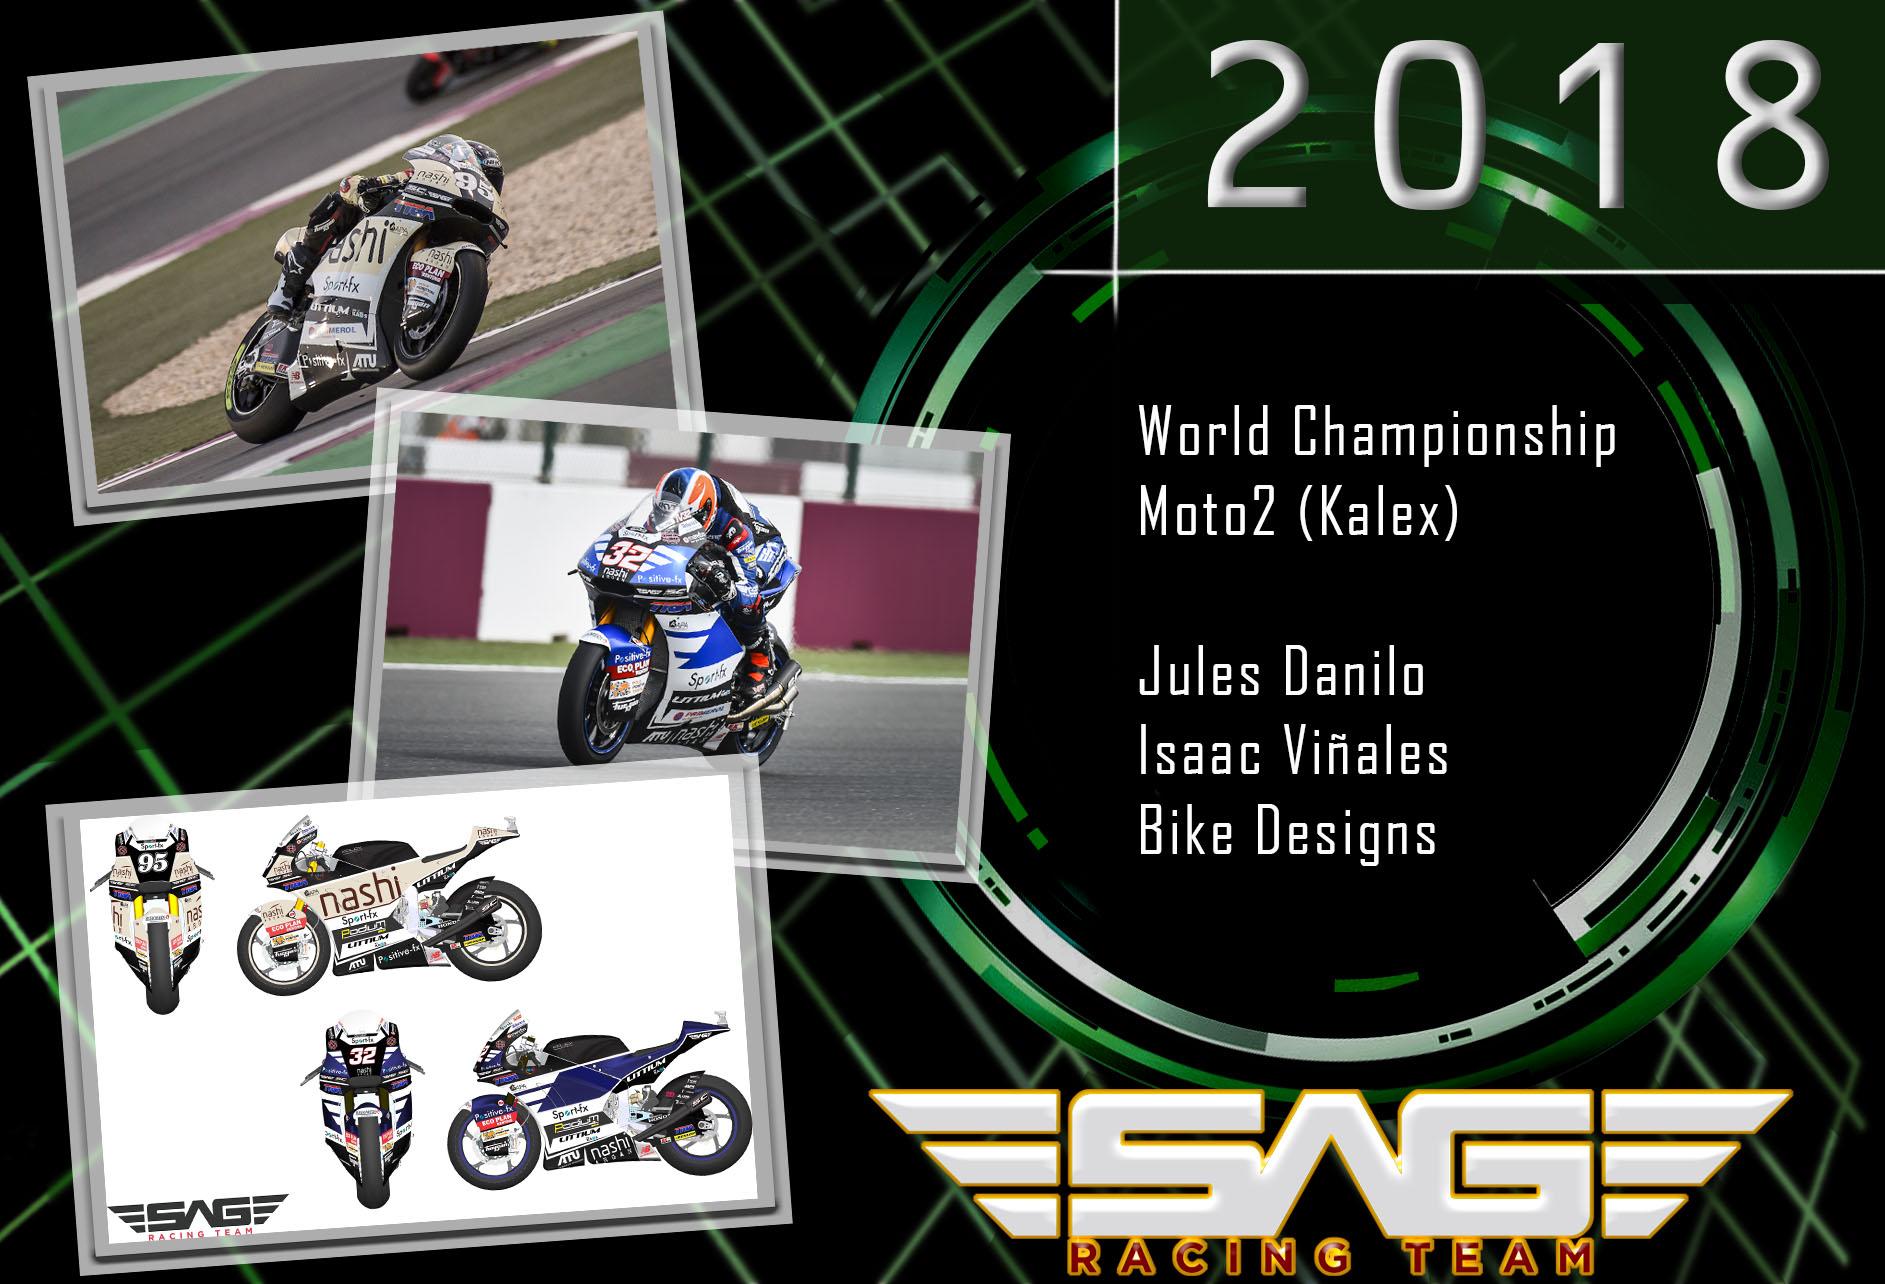 Jules Danilo & Isaac Viñales Moto2 Riders